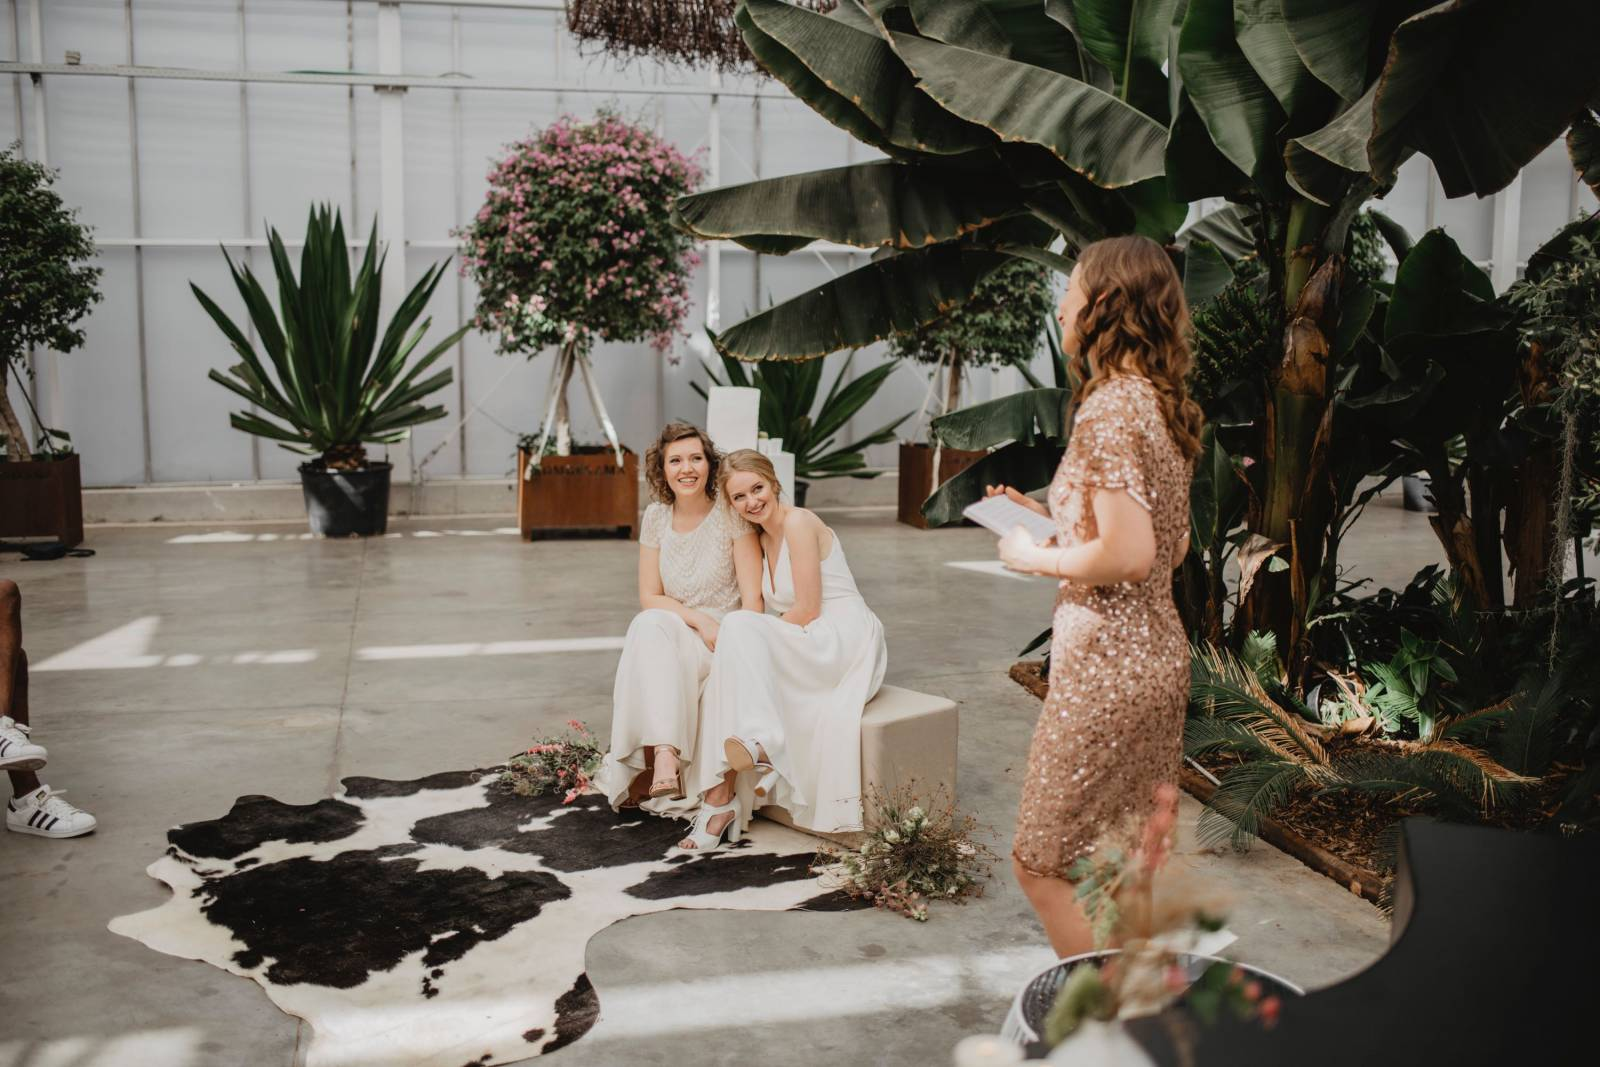 Merveil - Ceremoniespreker - IrmyPhotography - House of Weddings - 5